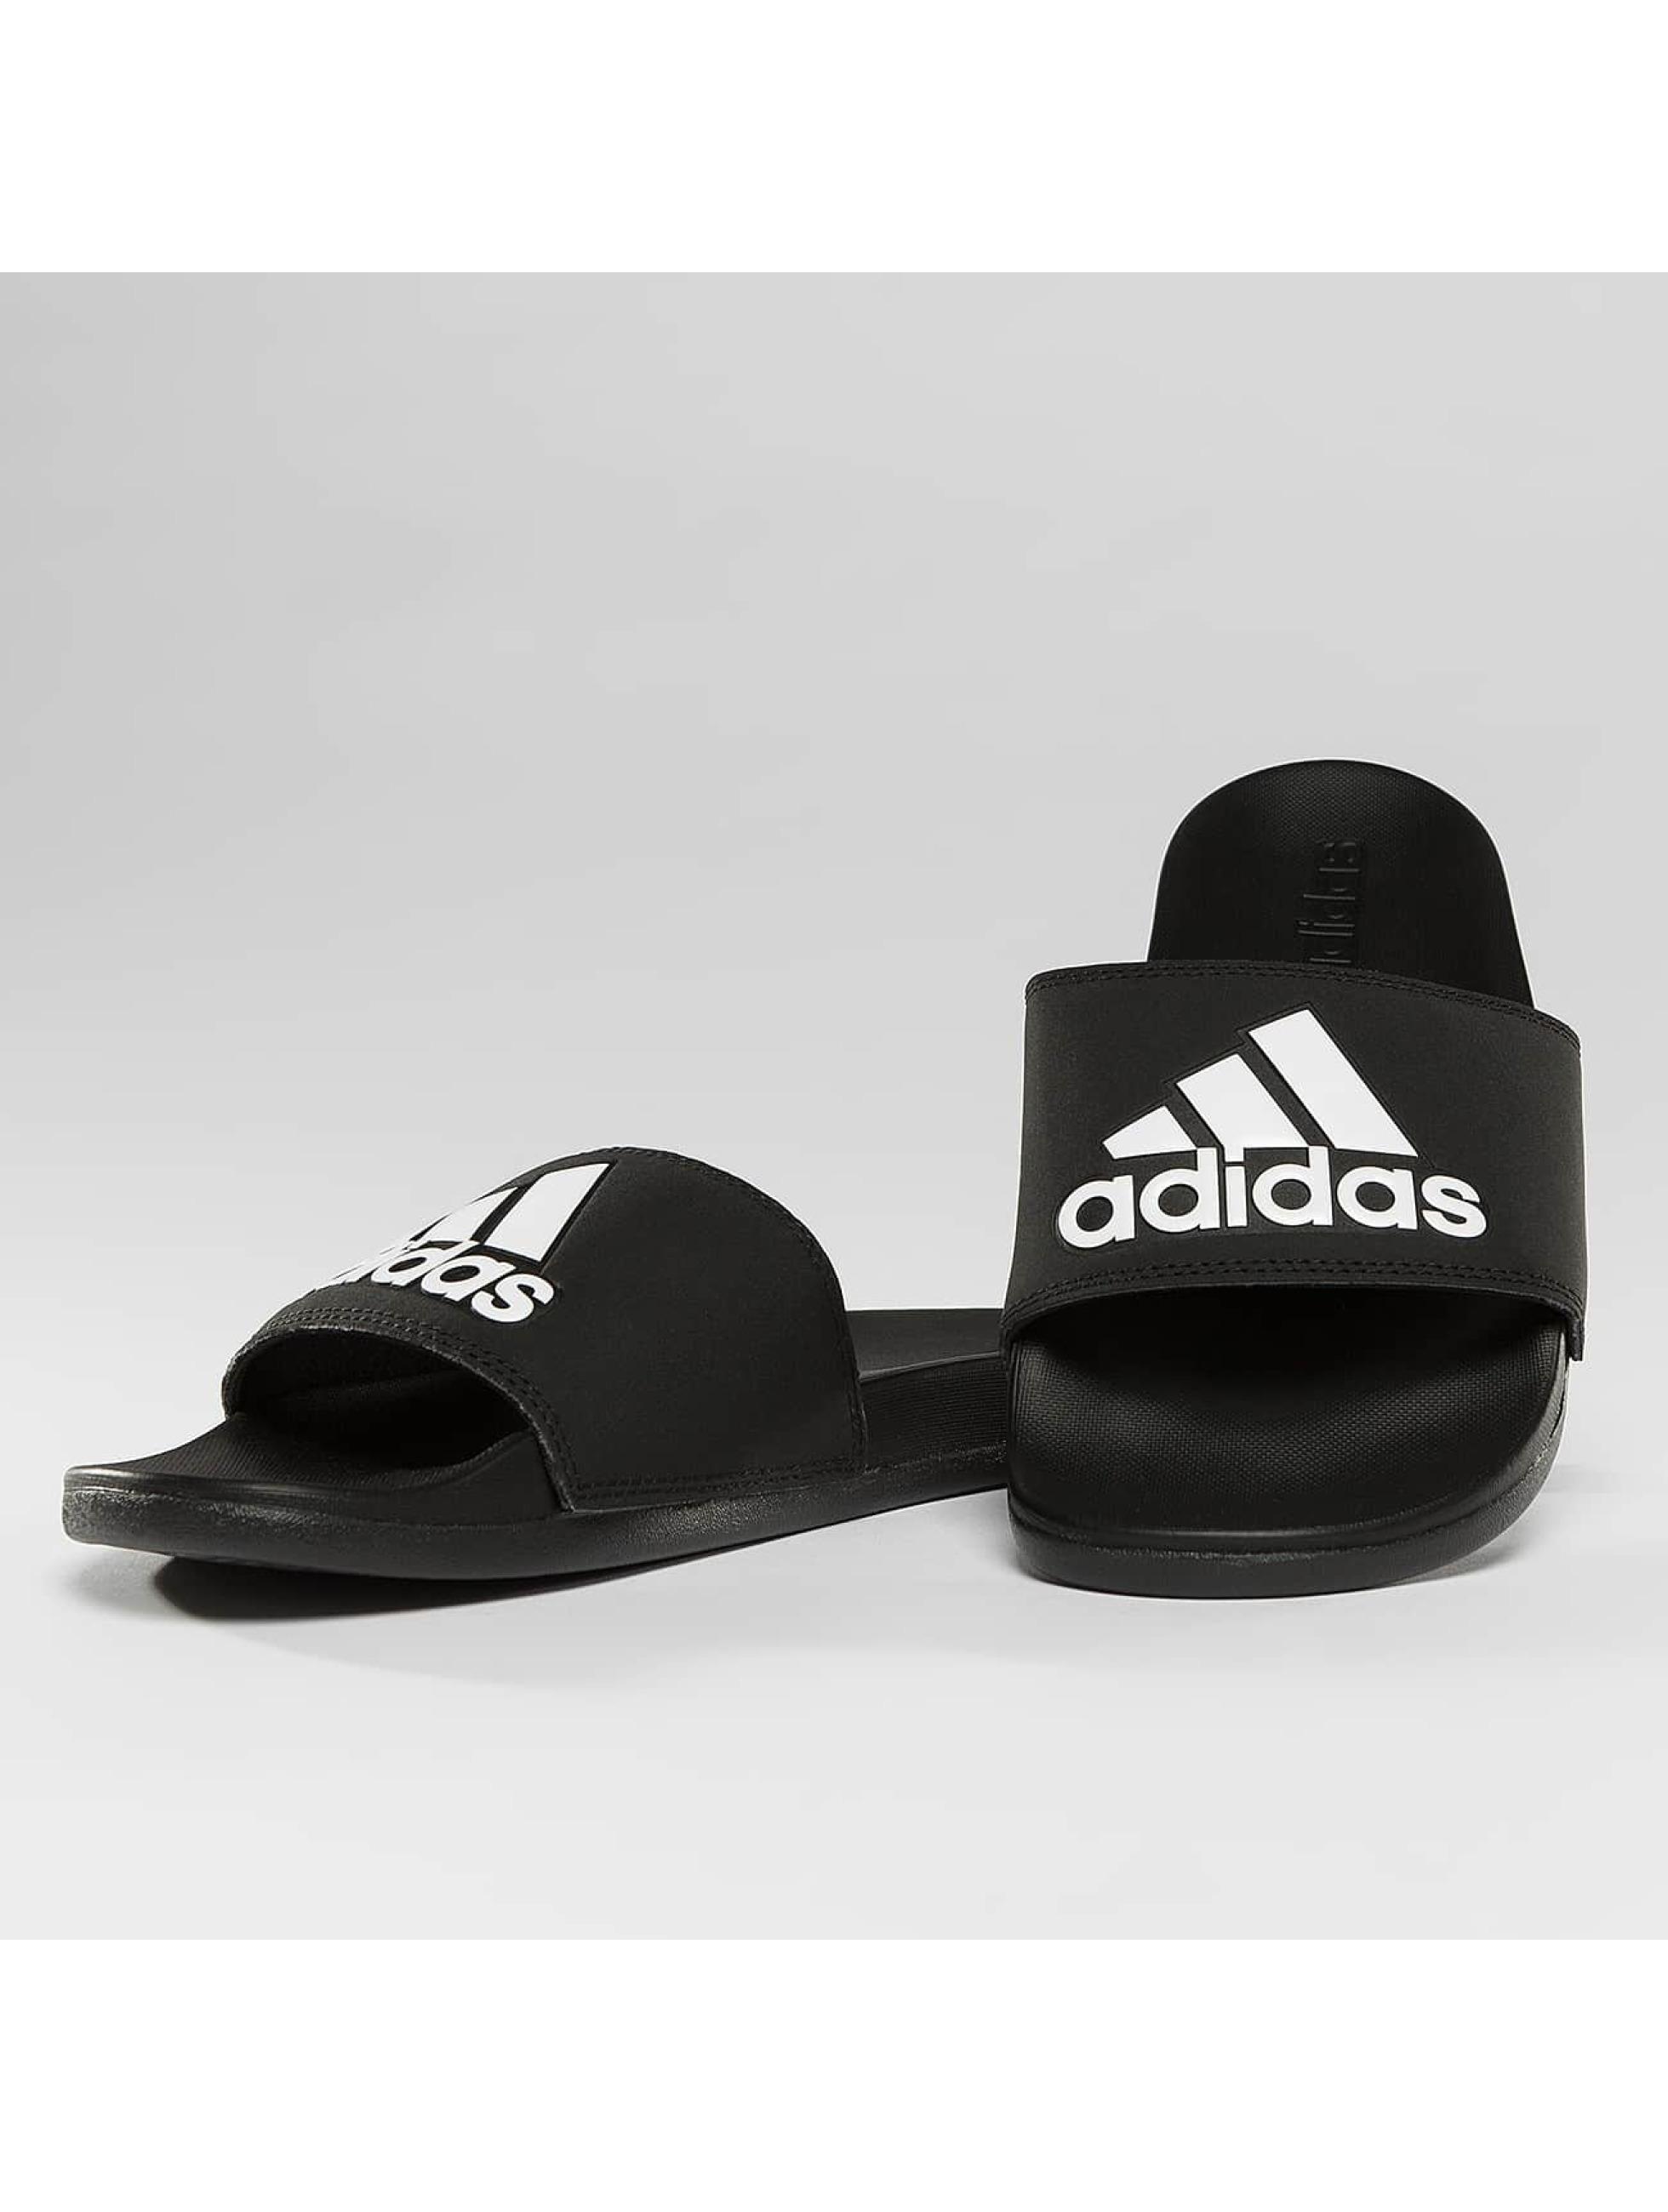 adidas Performance Slipper/Sandaal Adilette Comfort zwart